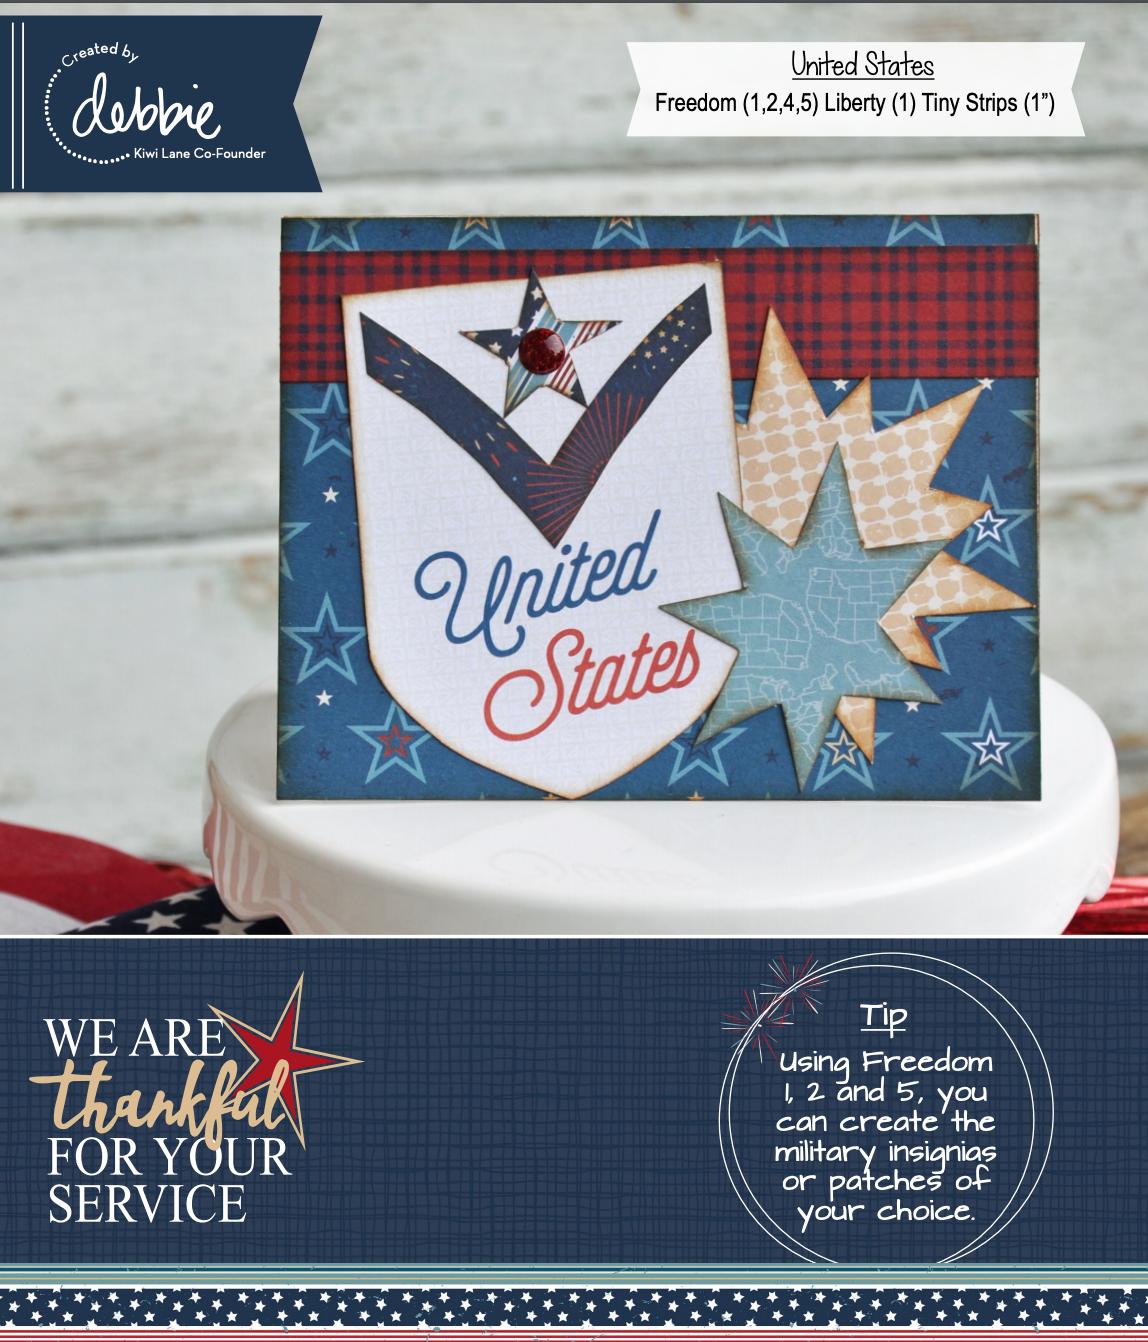 United States Greeting Card Kiwi Lane Designs Greeting Cards Handmade Cards